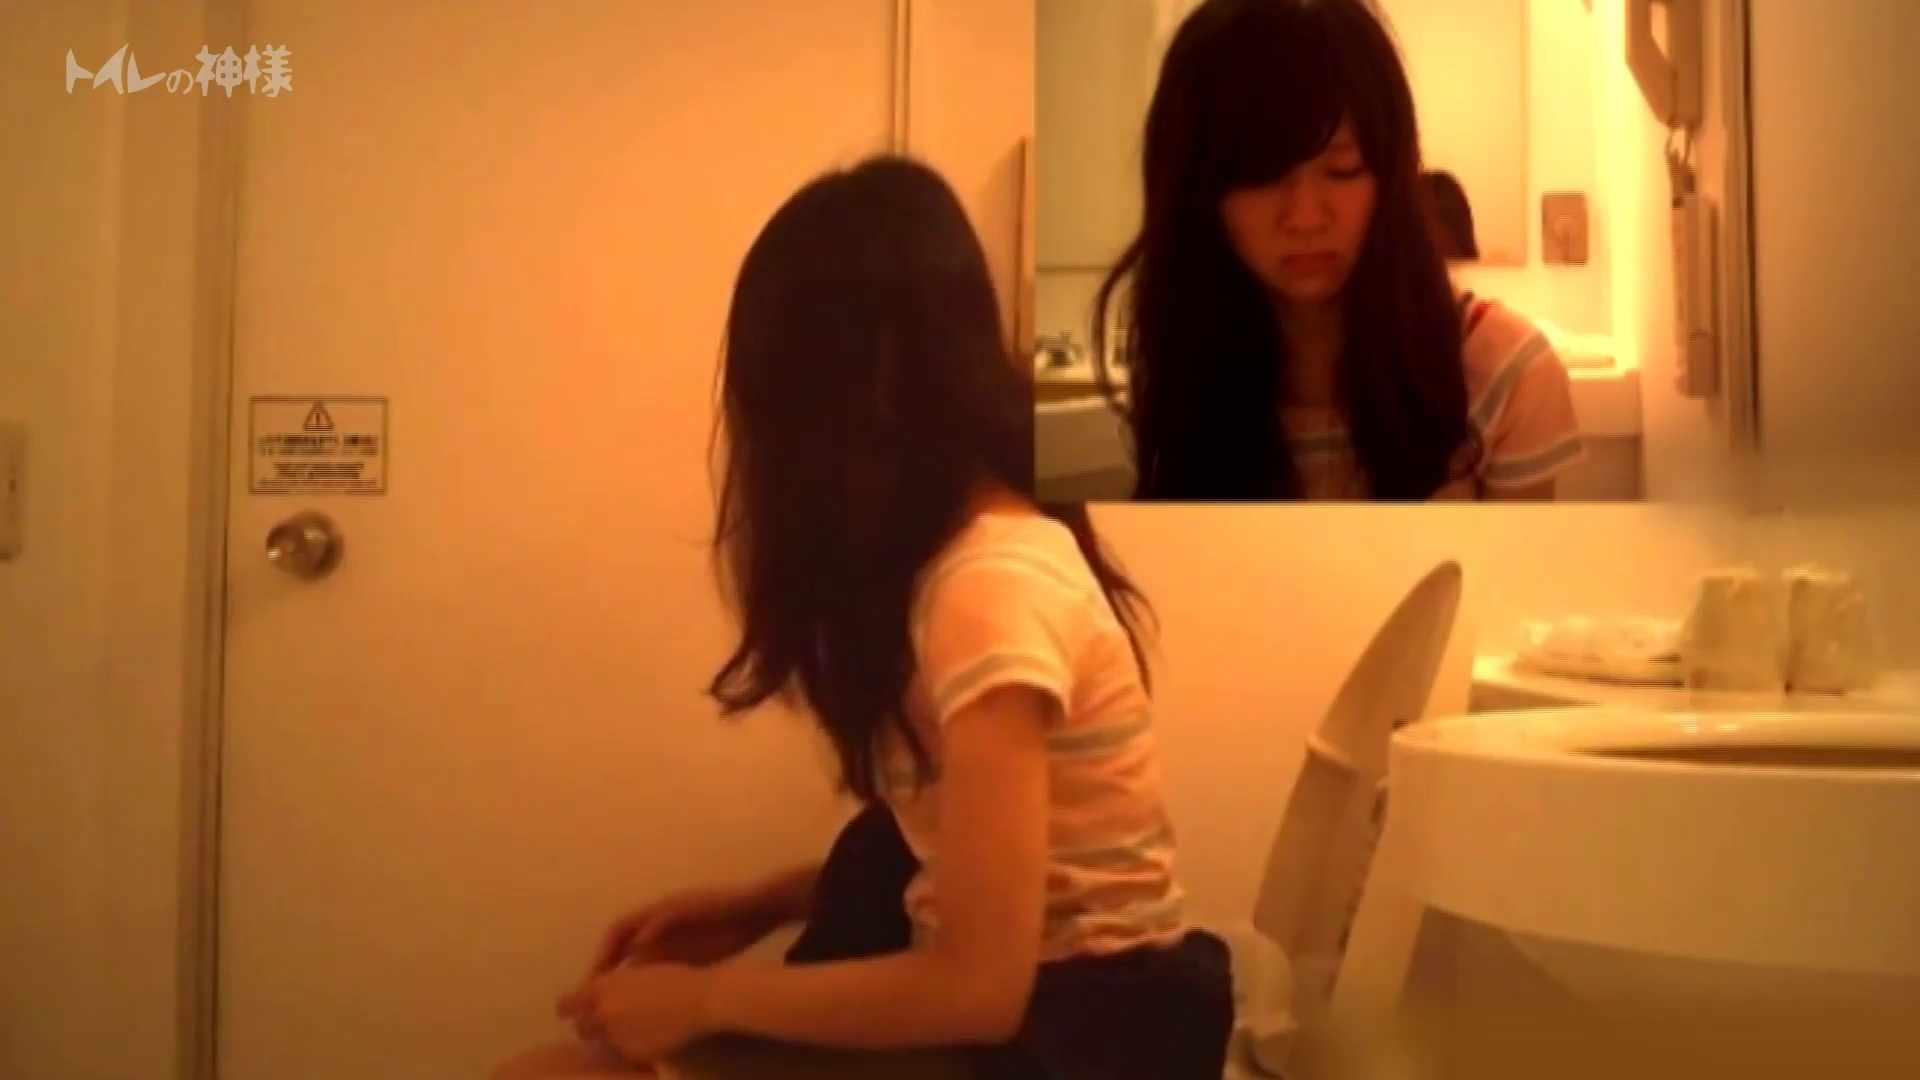 Vol.04 女子大生のトイレ恥態 OLハメ撮り  104Pix 64